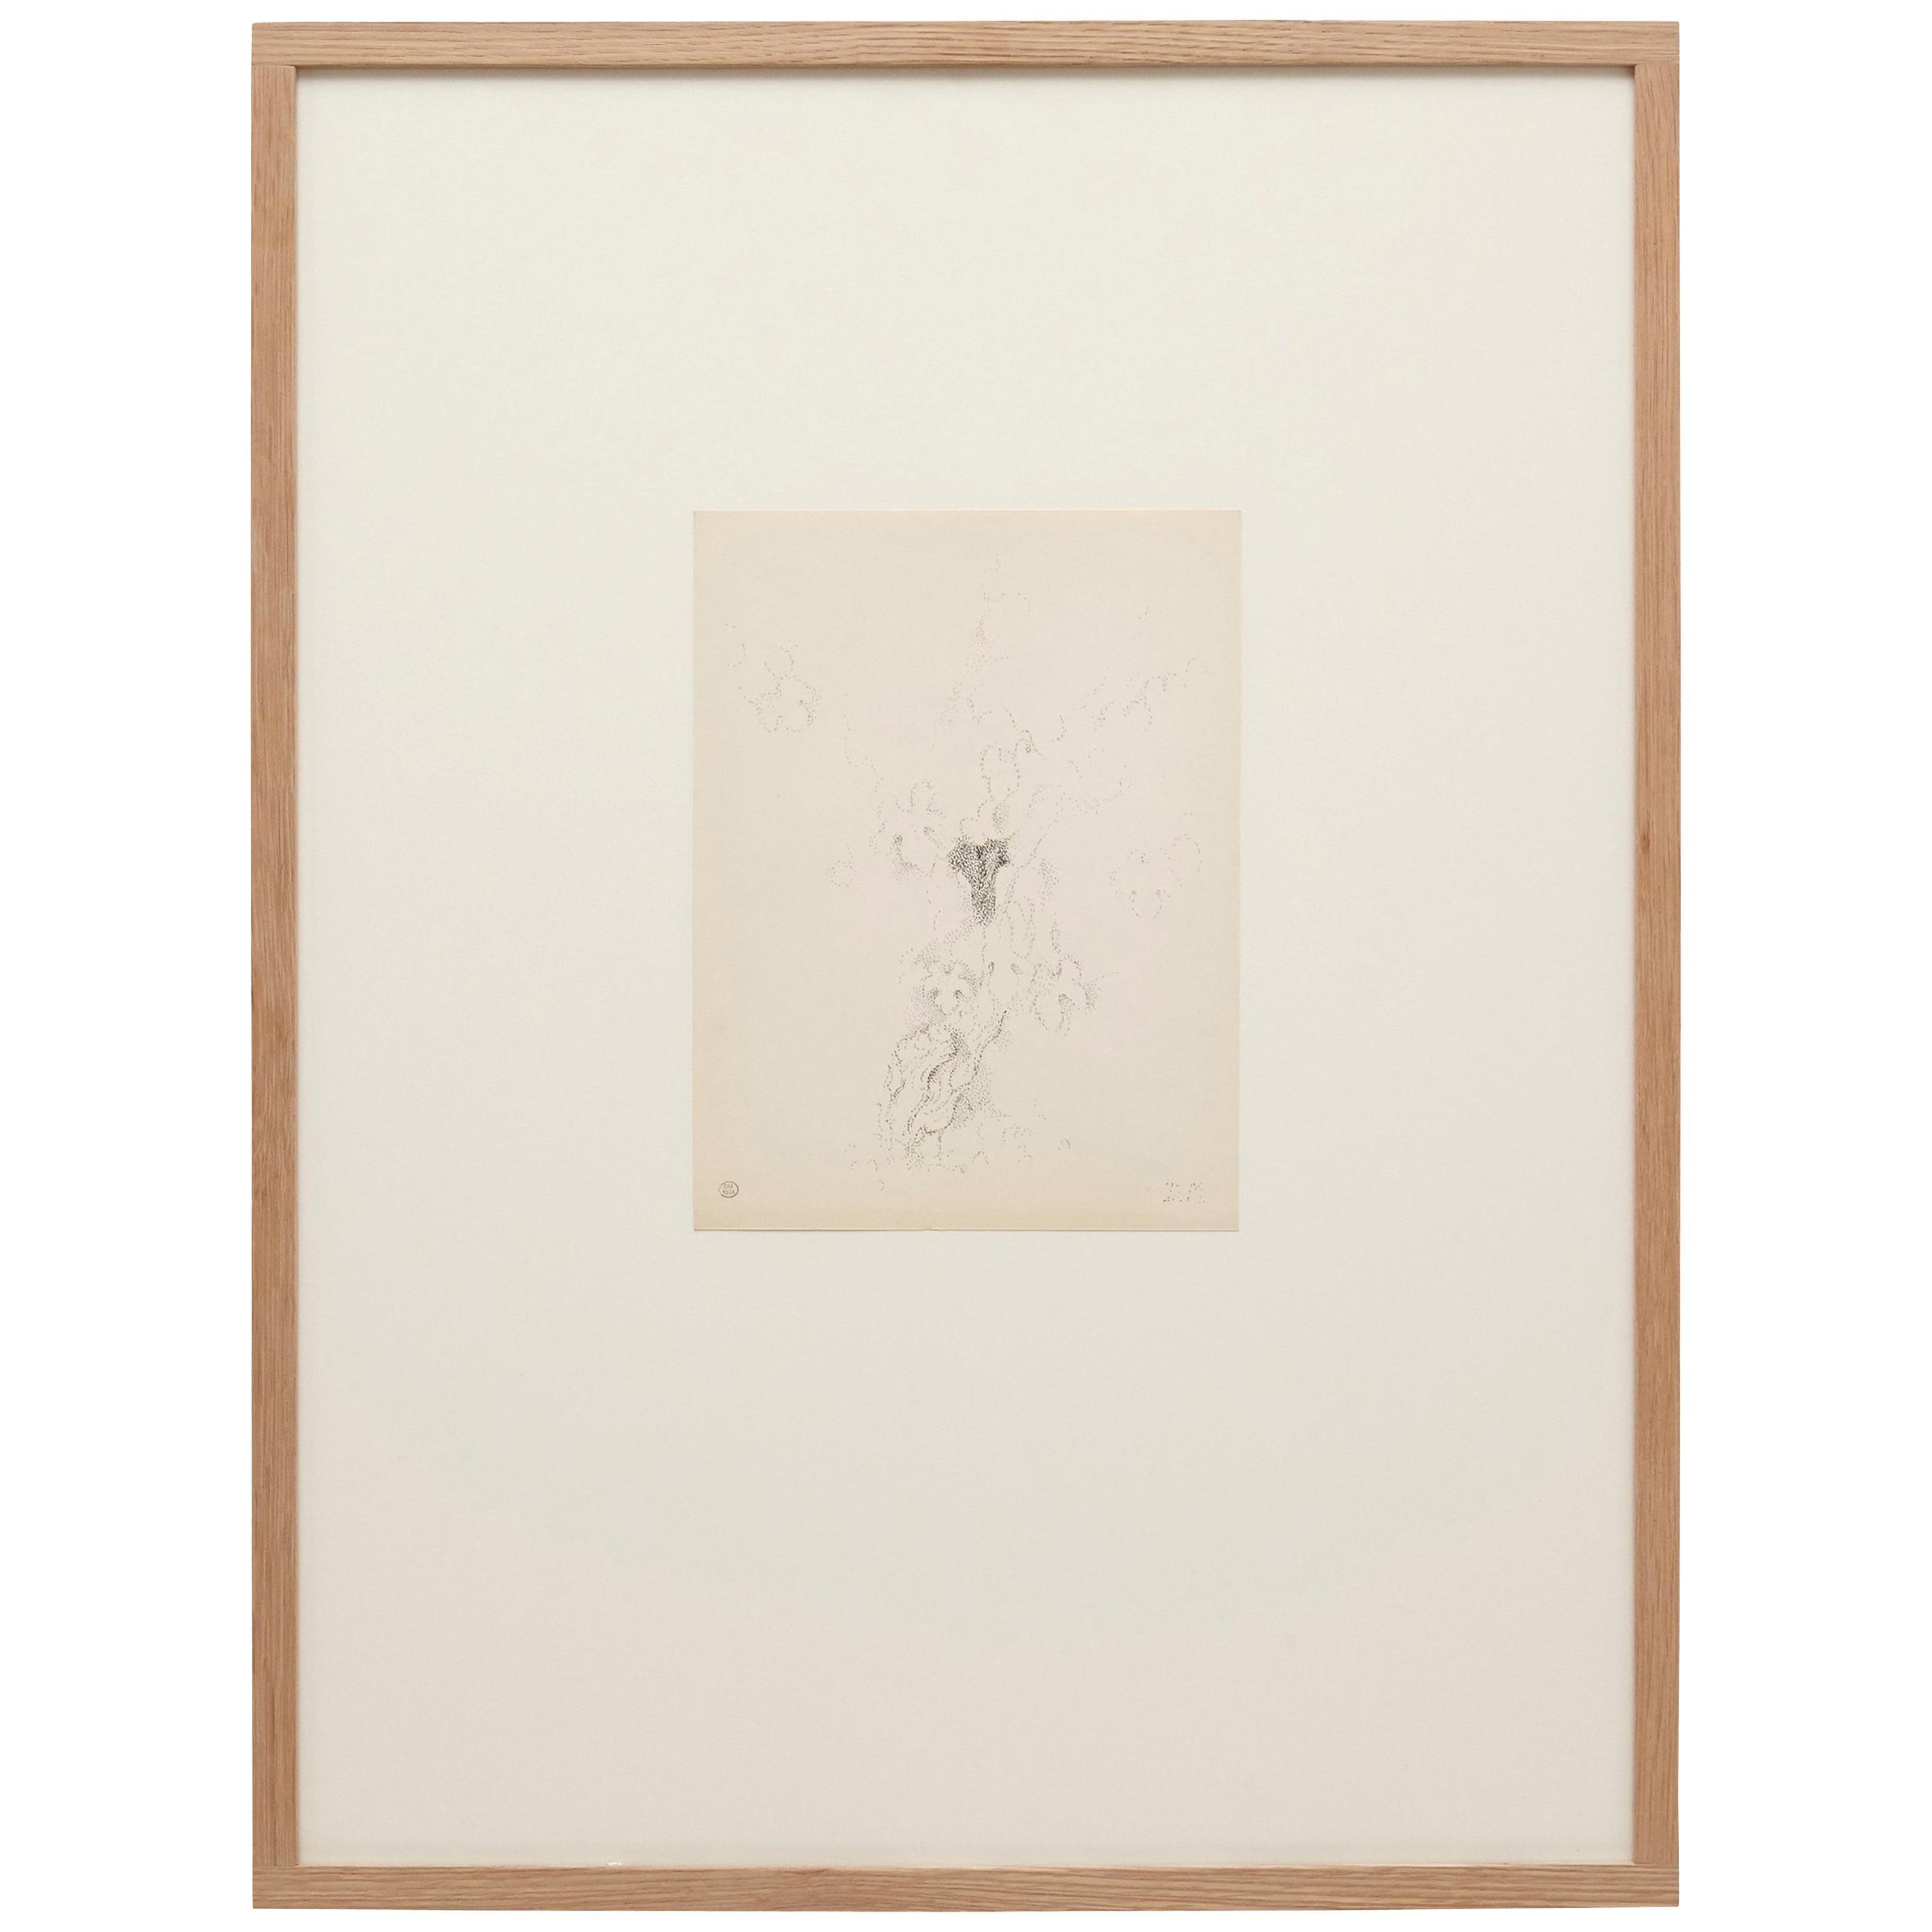 Pointillist Drawing on Paper by Dora Maar